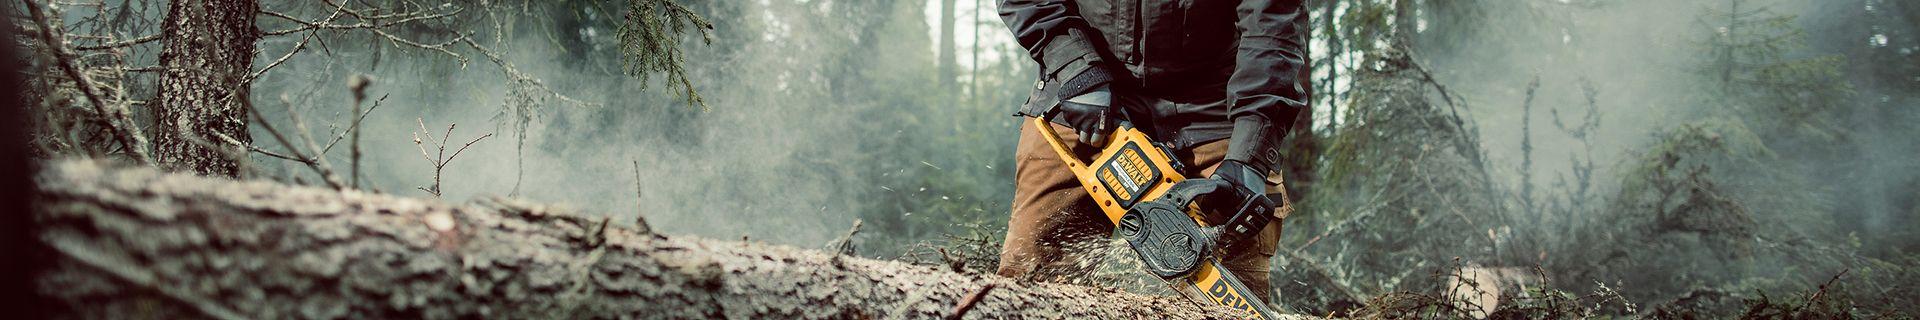 Chainsaw cutting through log